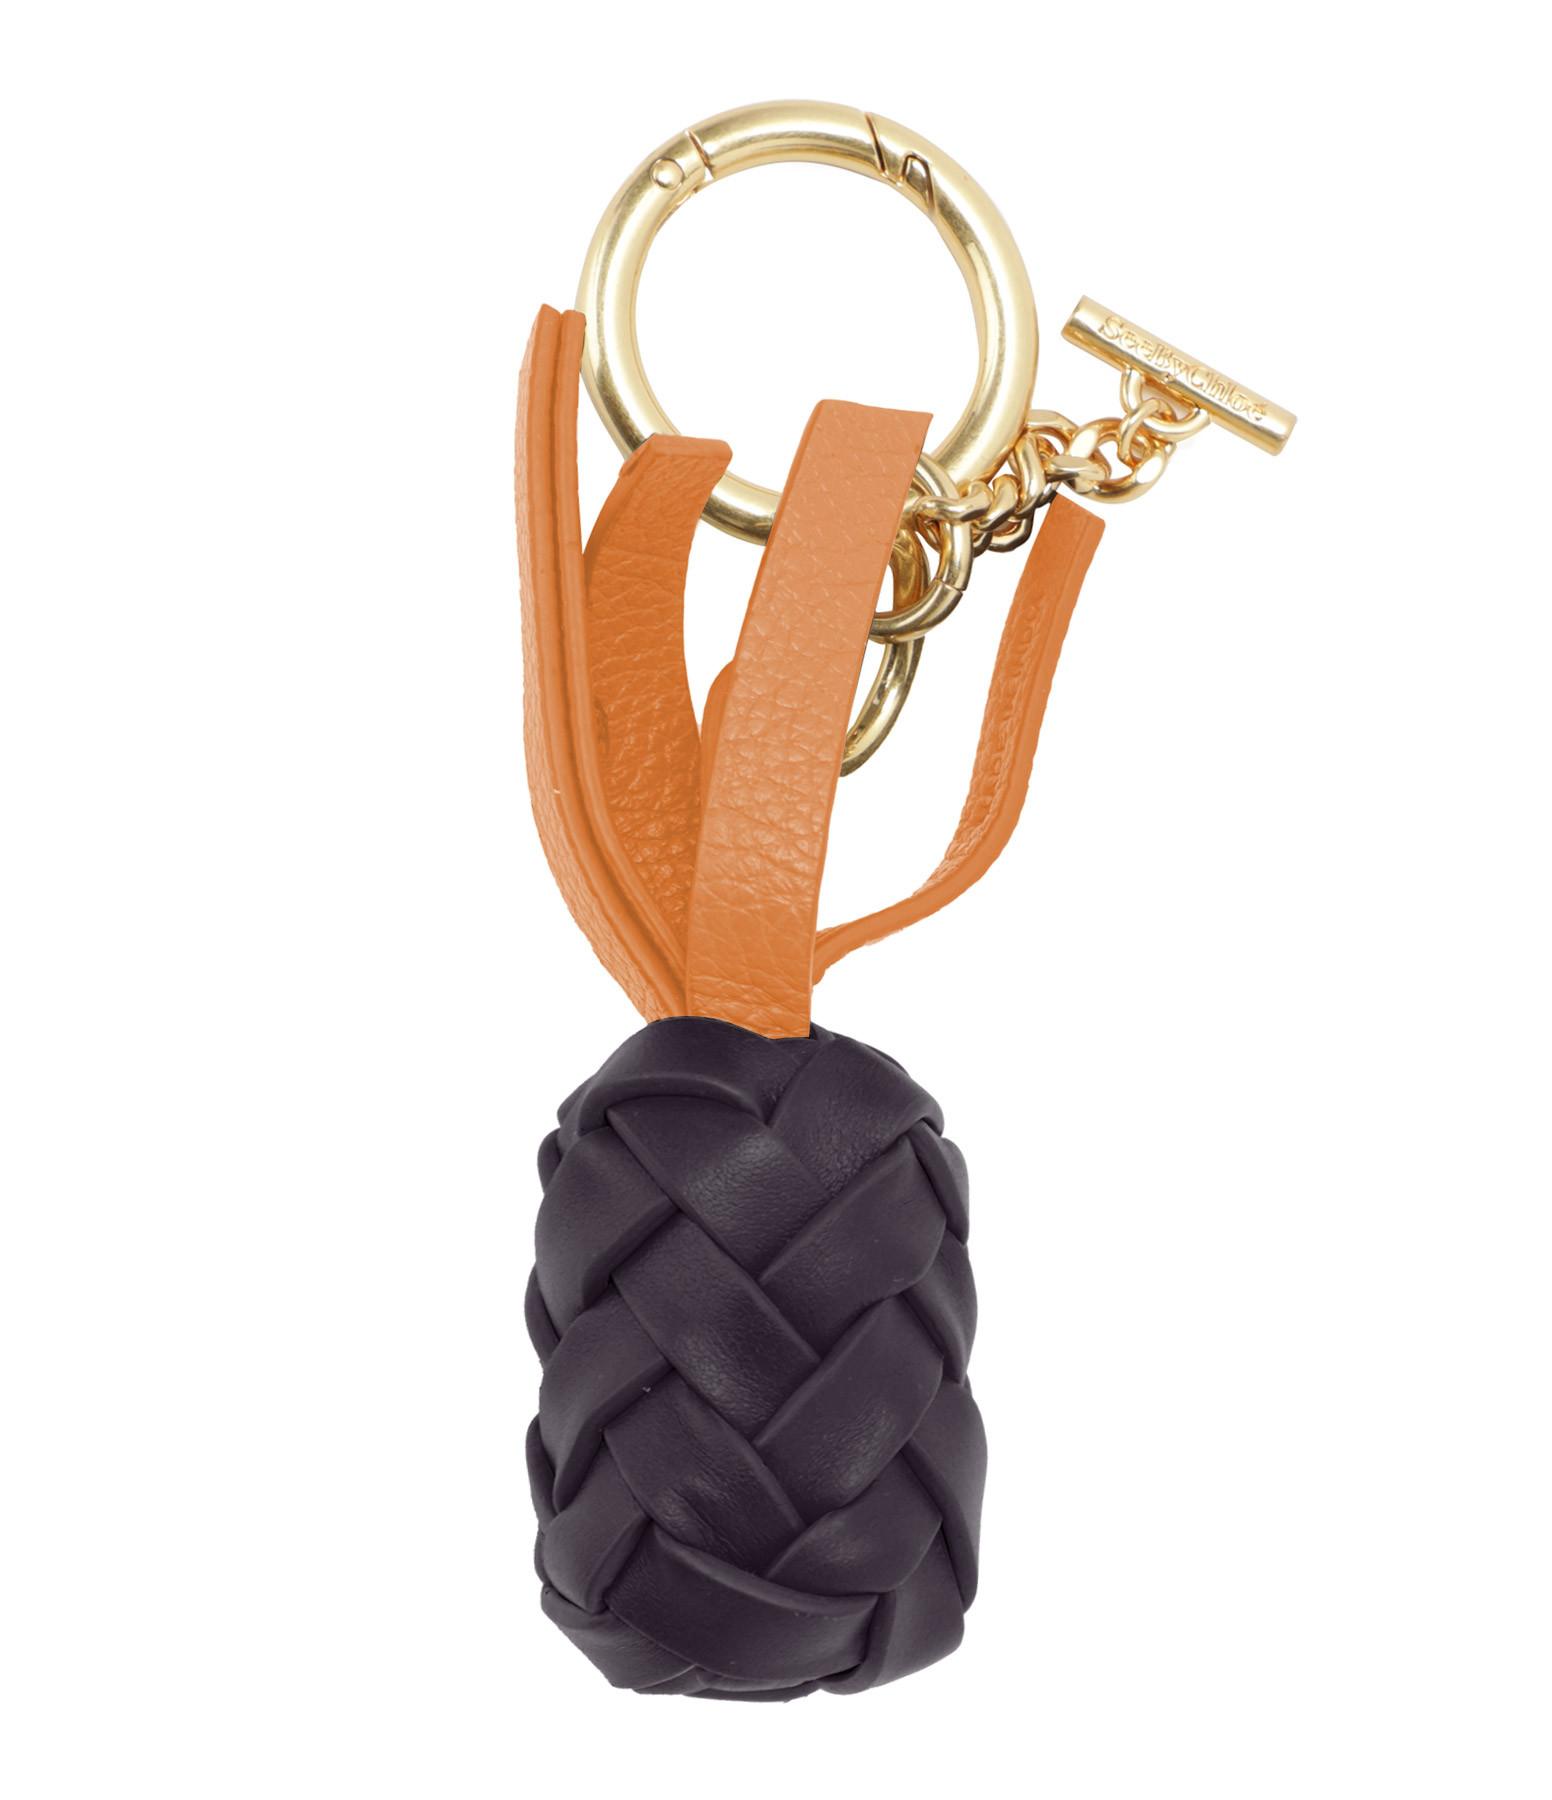 SEE BY CHLOE - Porte-clés Pineapple Cuir Violet Foncé